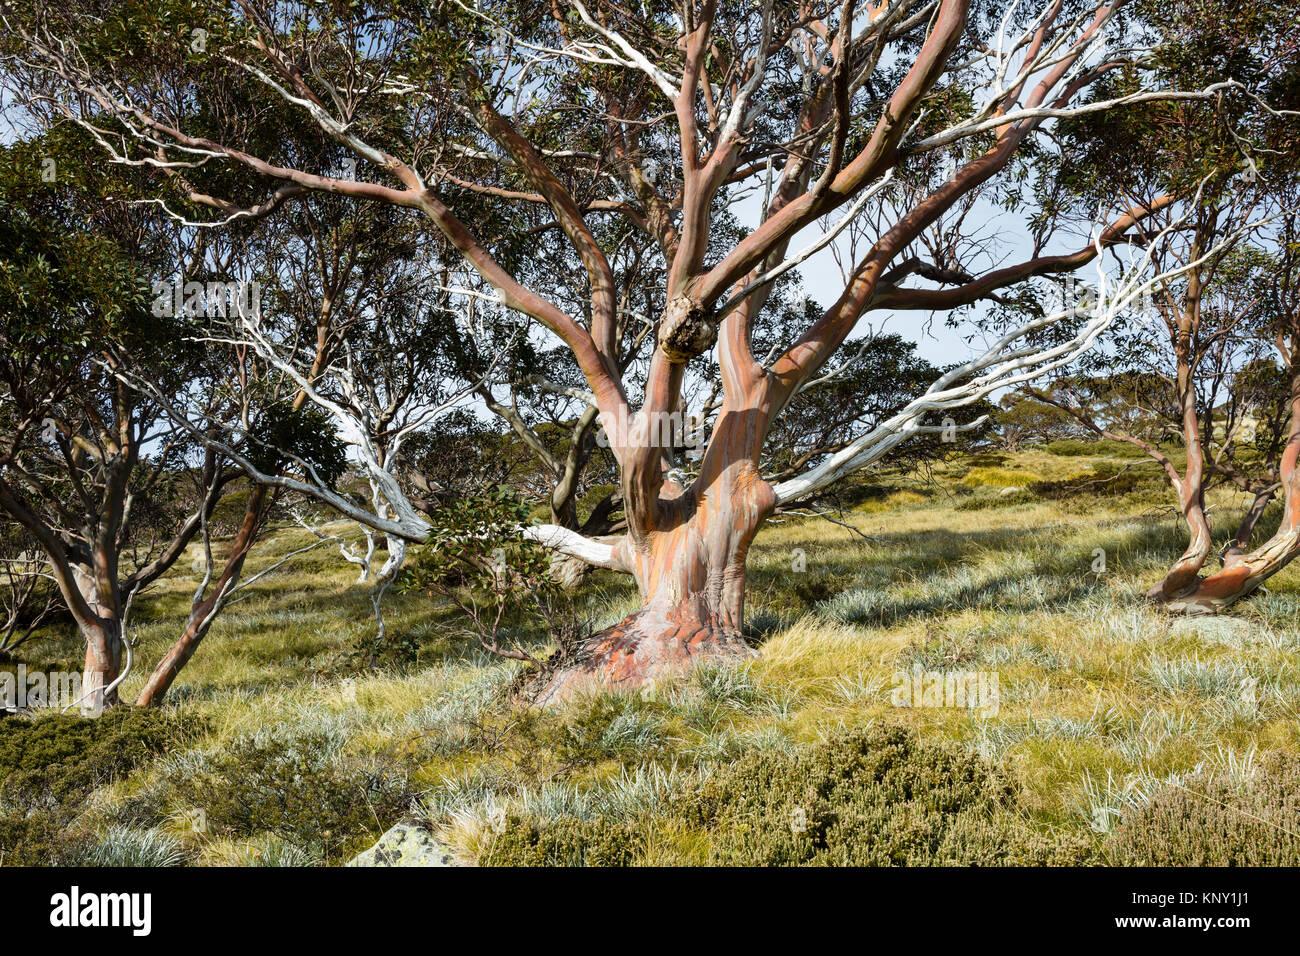 Snow Gum tree (Eucalyptus pauciflora) in autumn near the Snowy River in Kosciuszko National Park in the Snowy Mountains - Stock Image